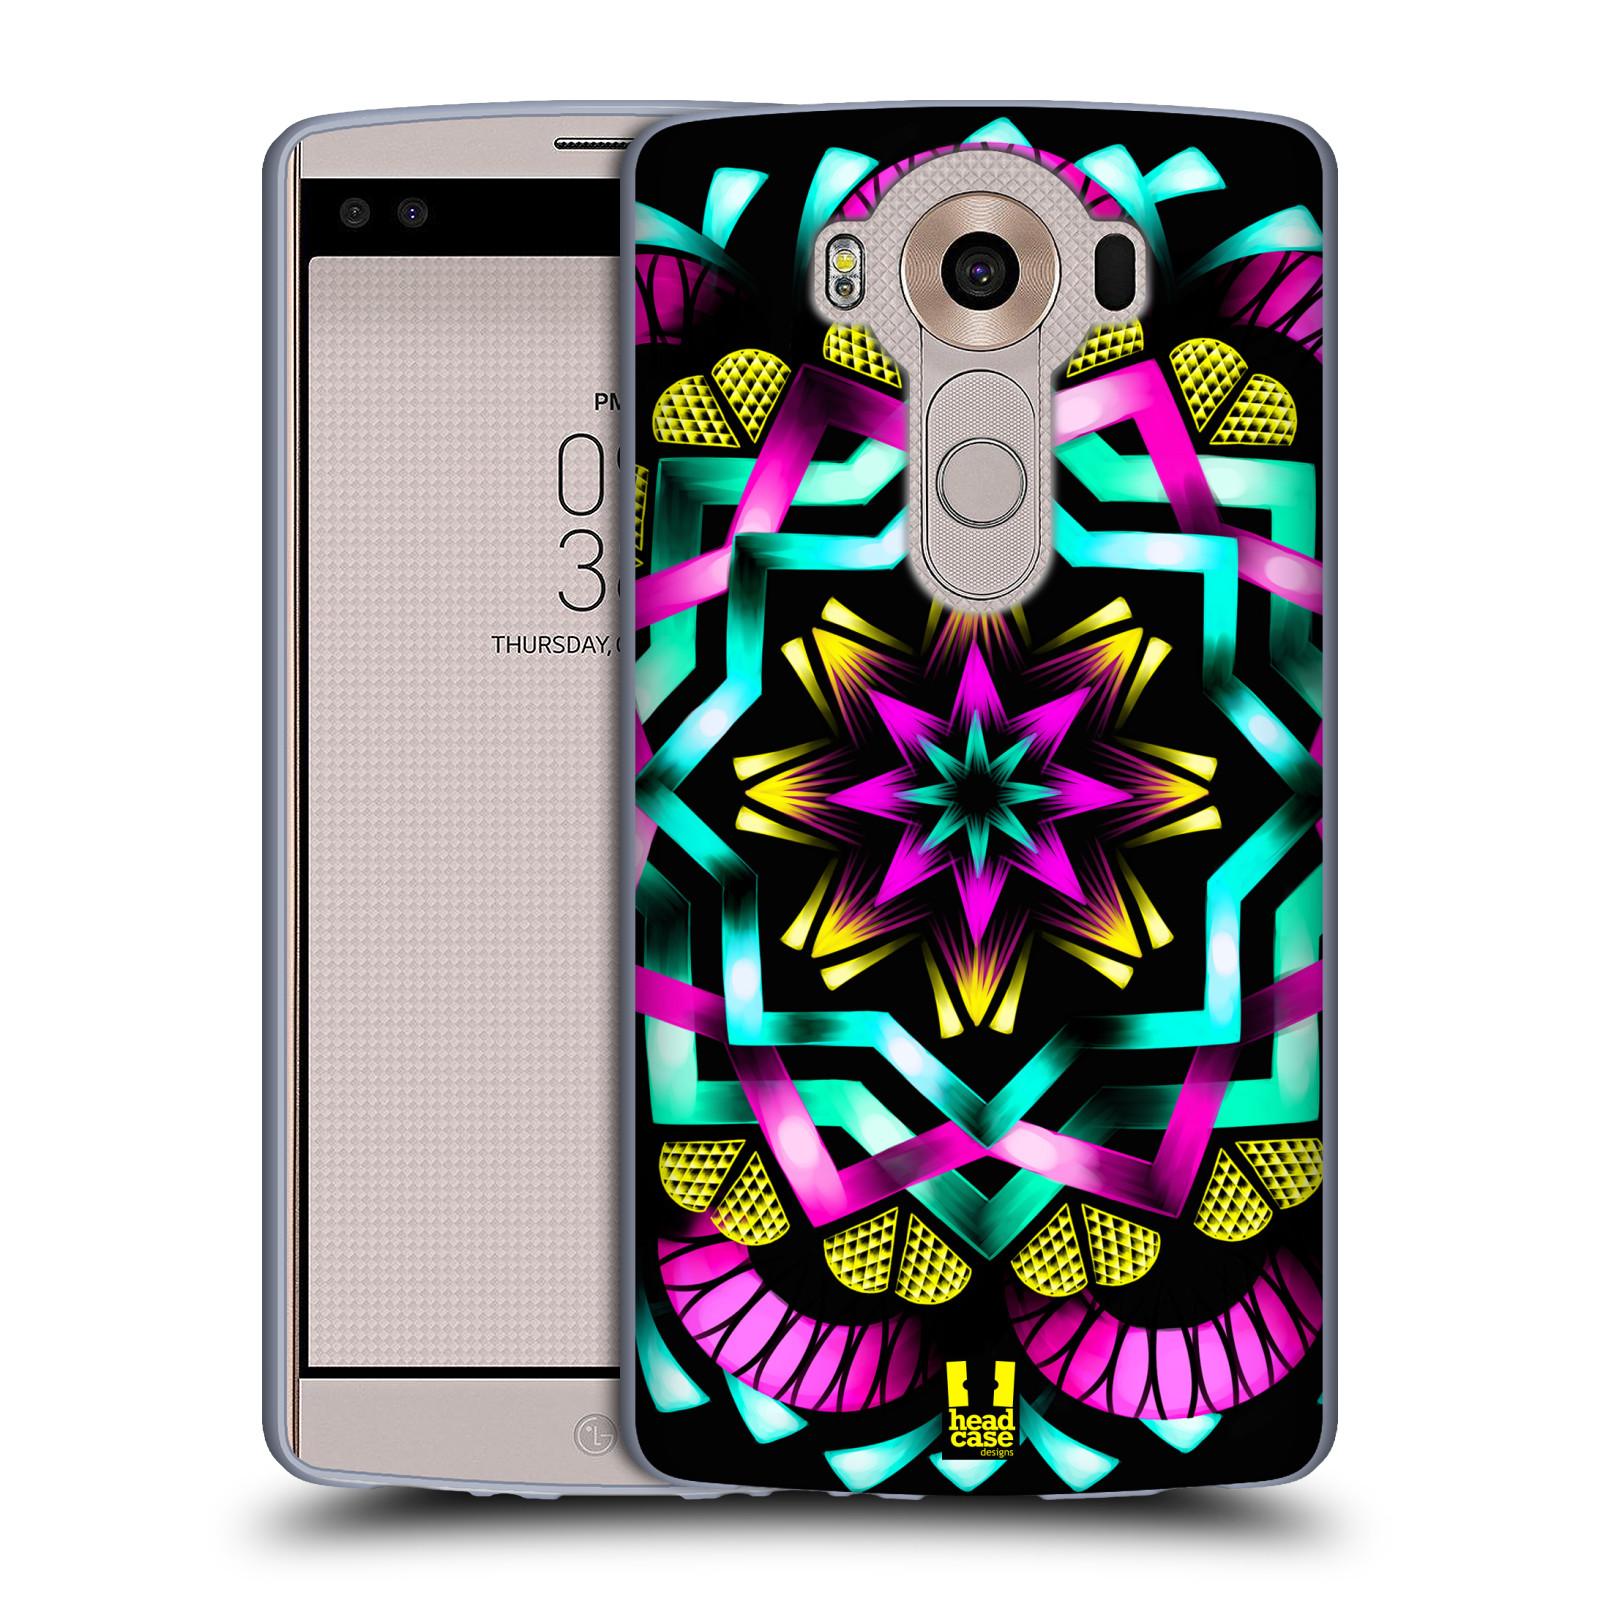 HEAD CASE silikonový obal na mobil LG V10 (H960A) vzor Indie Mandala kaleidoskop barevný vzor SLUNCE